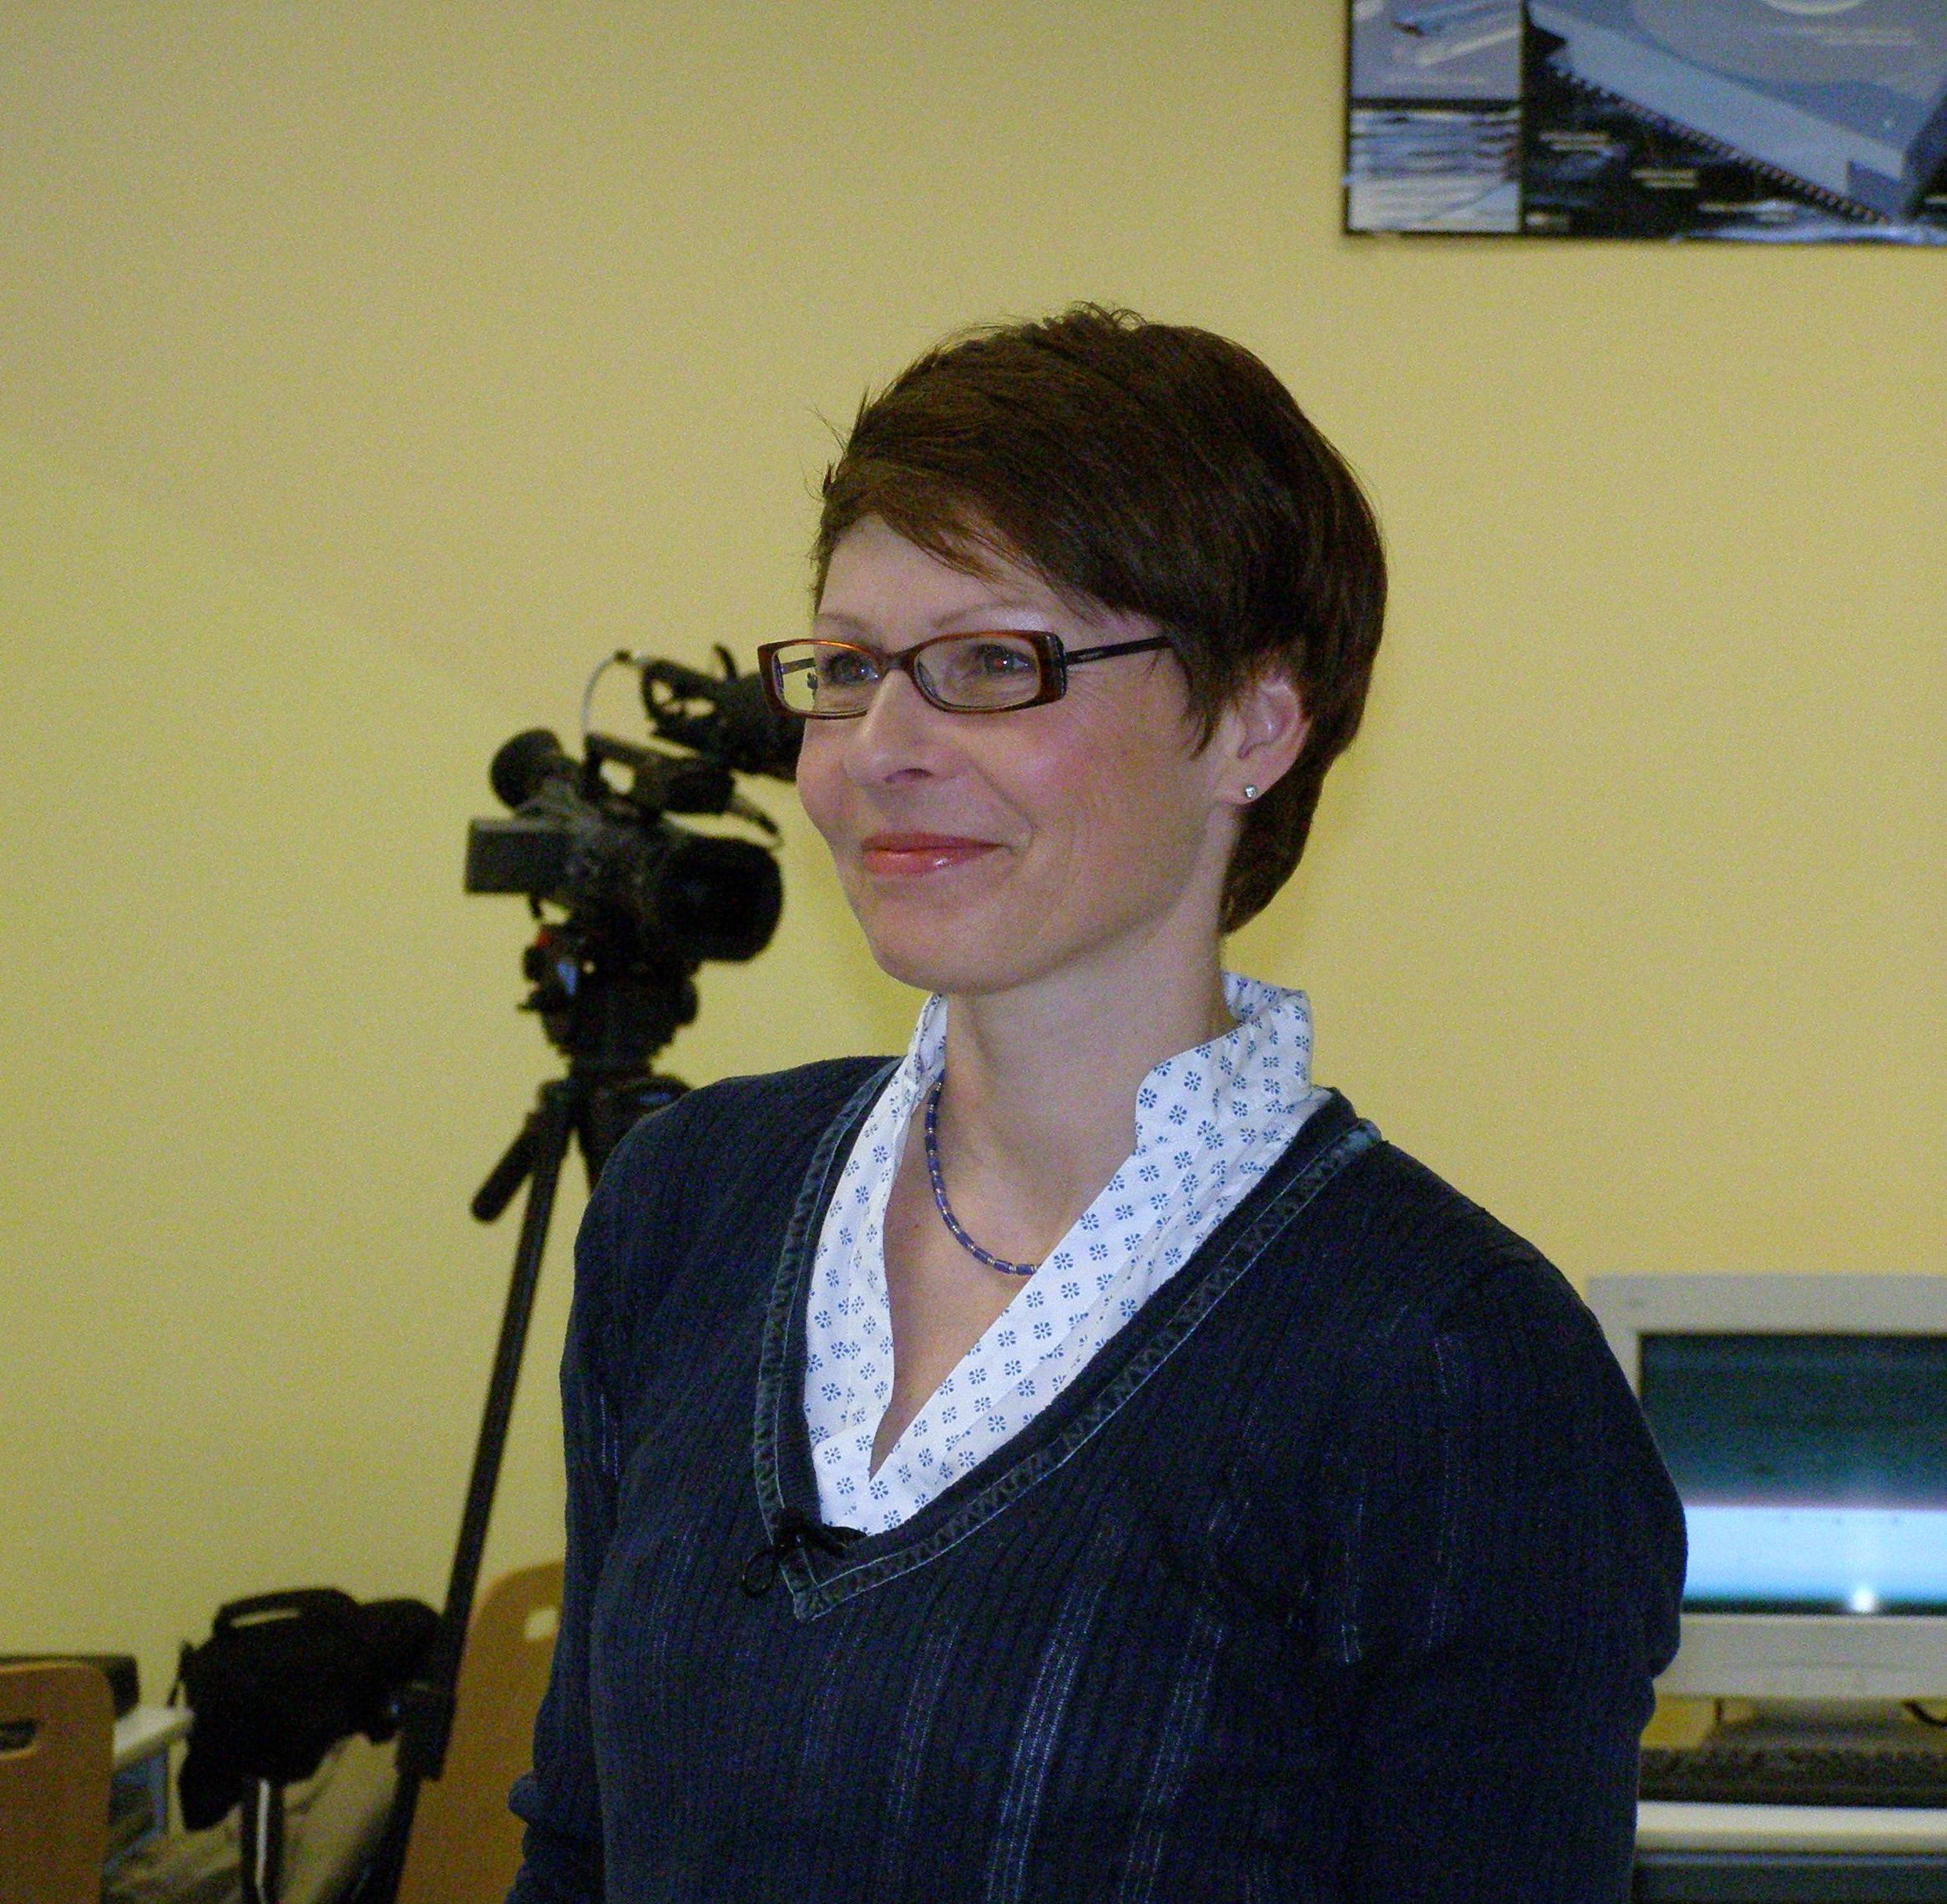 Mgr. Veronika Holíková